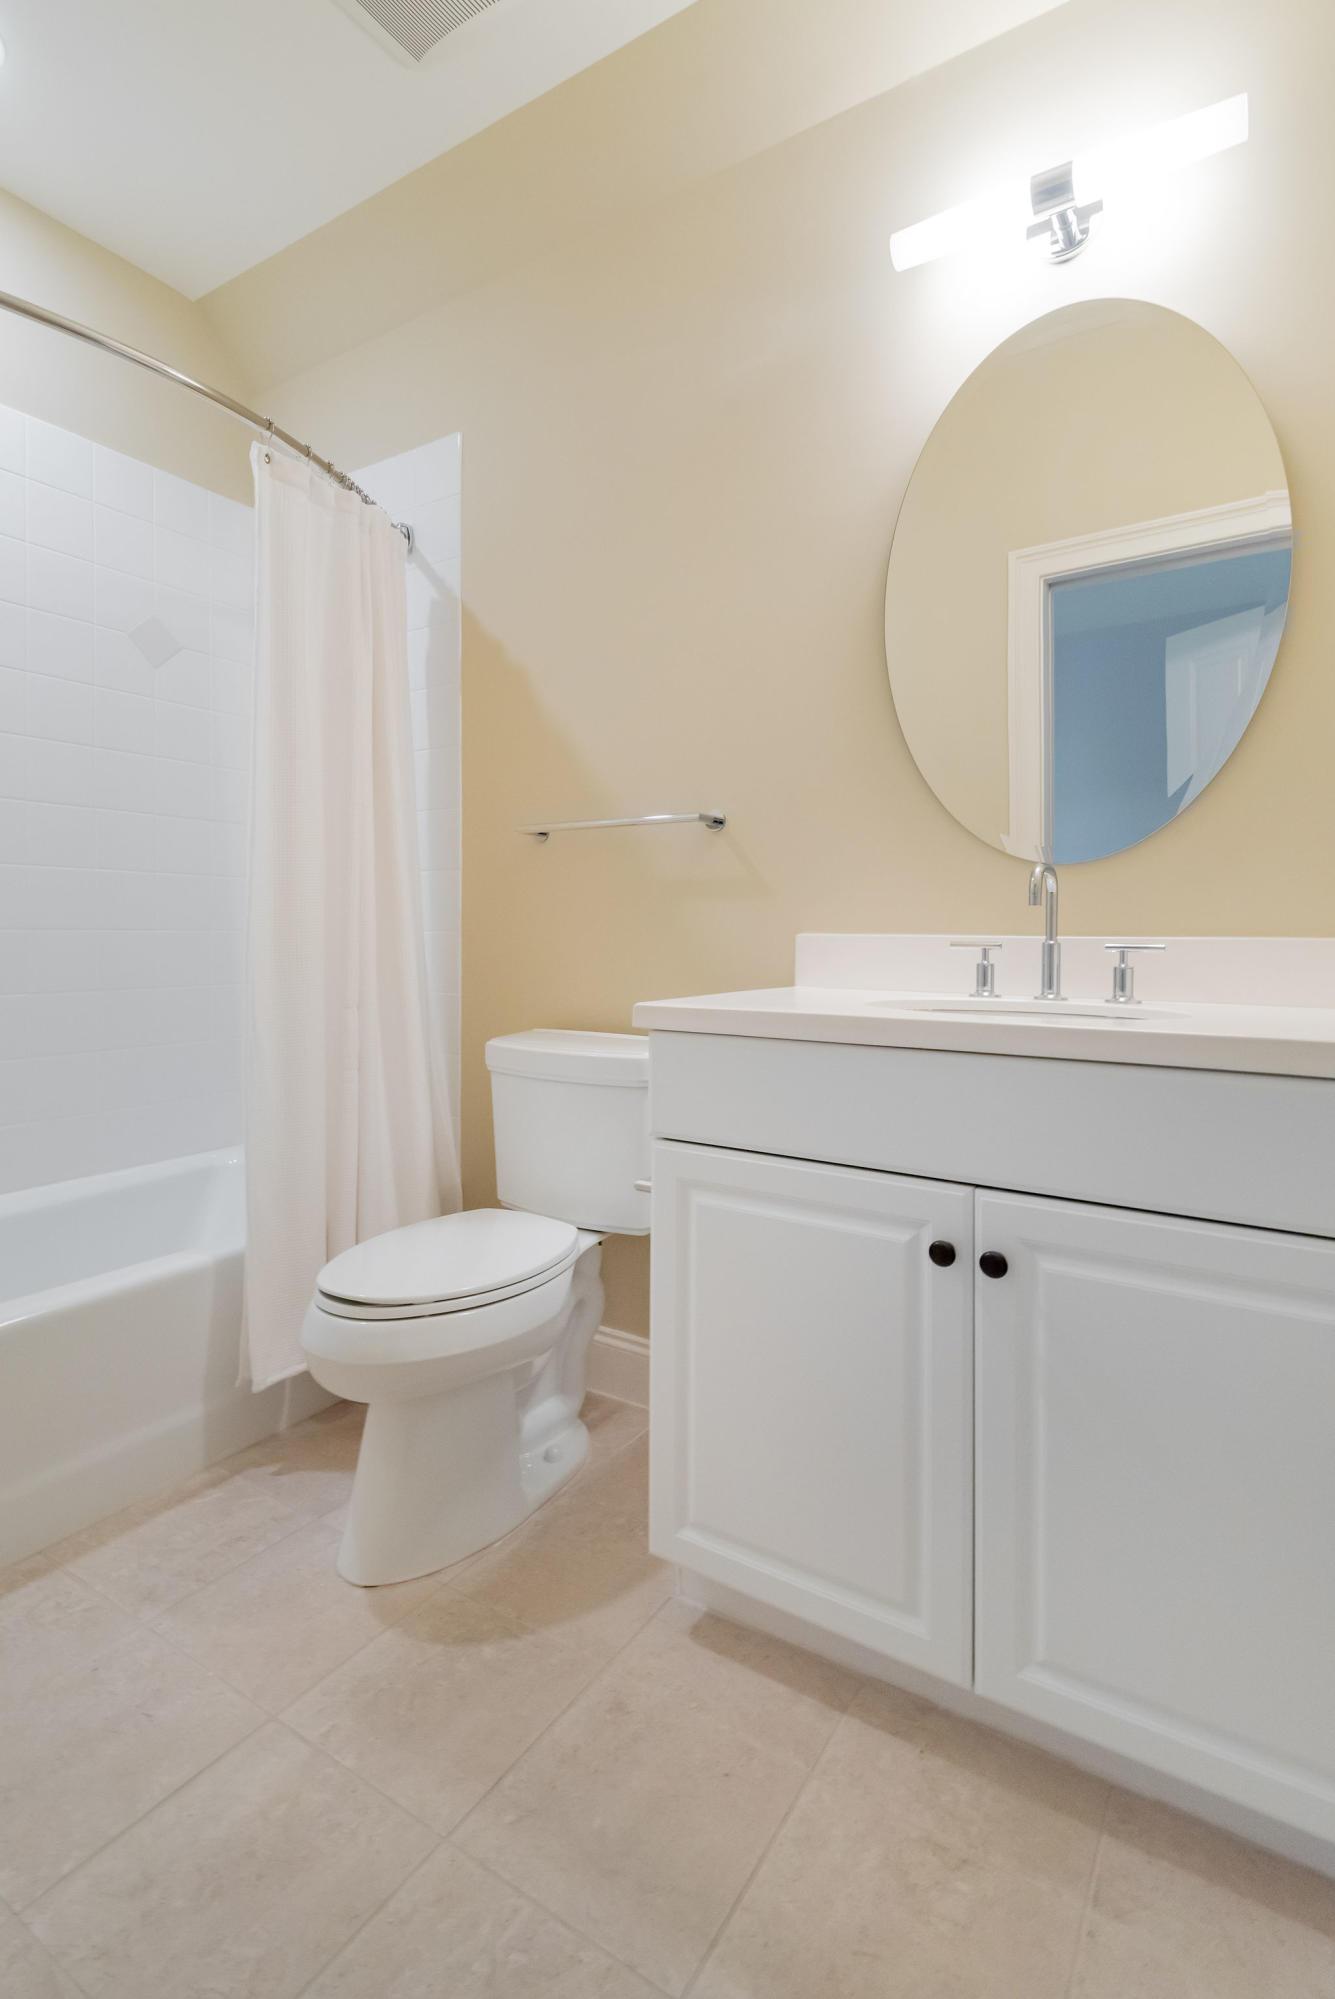 Kiawah Island Homes For Sale - 3 Grey Widgeon, Kiawah Island, SC - 36